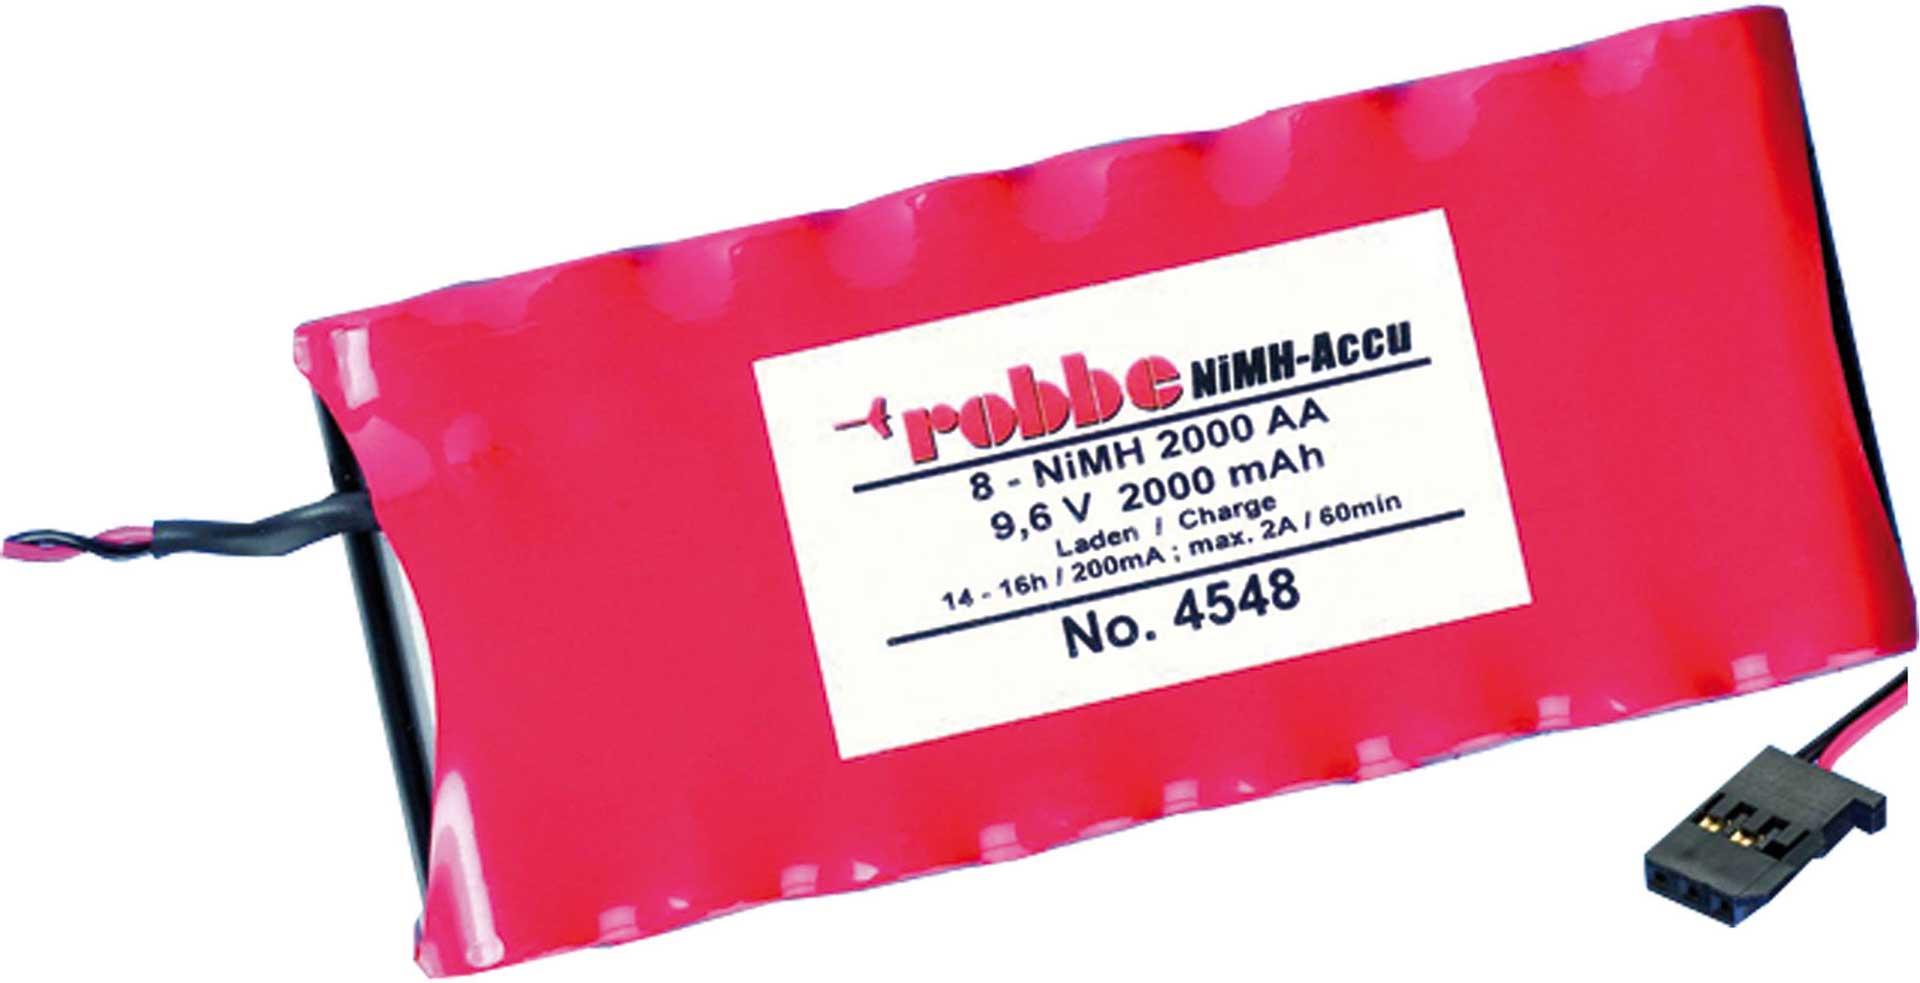 Robbe Modellsport SENDERAKKU 2000MAH / 9,6V T4EX, T6, T3G